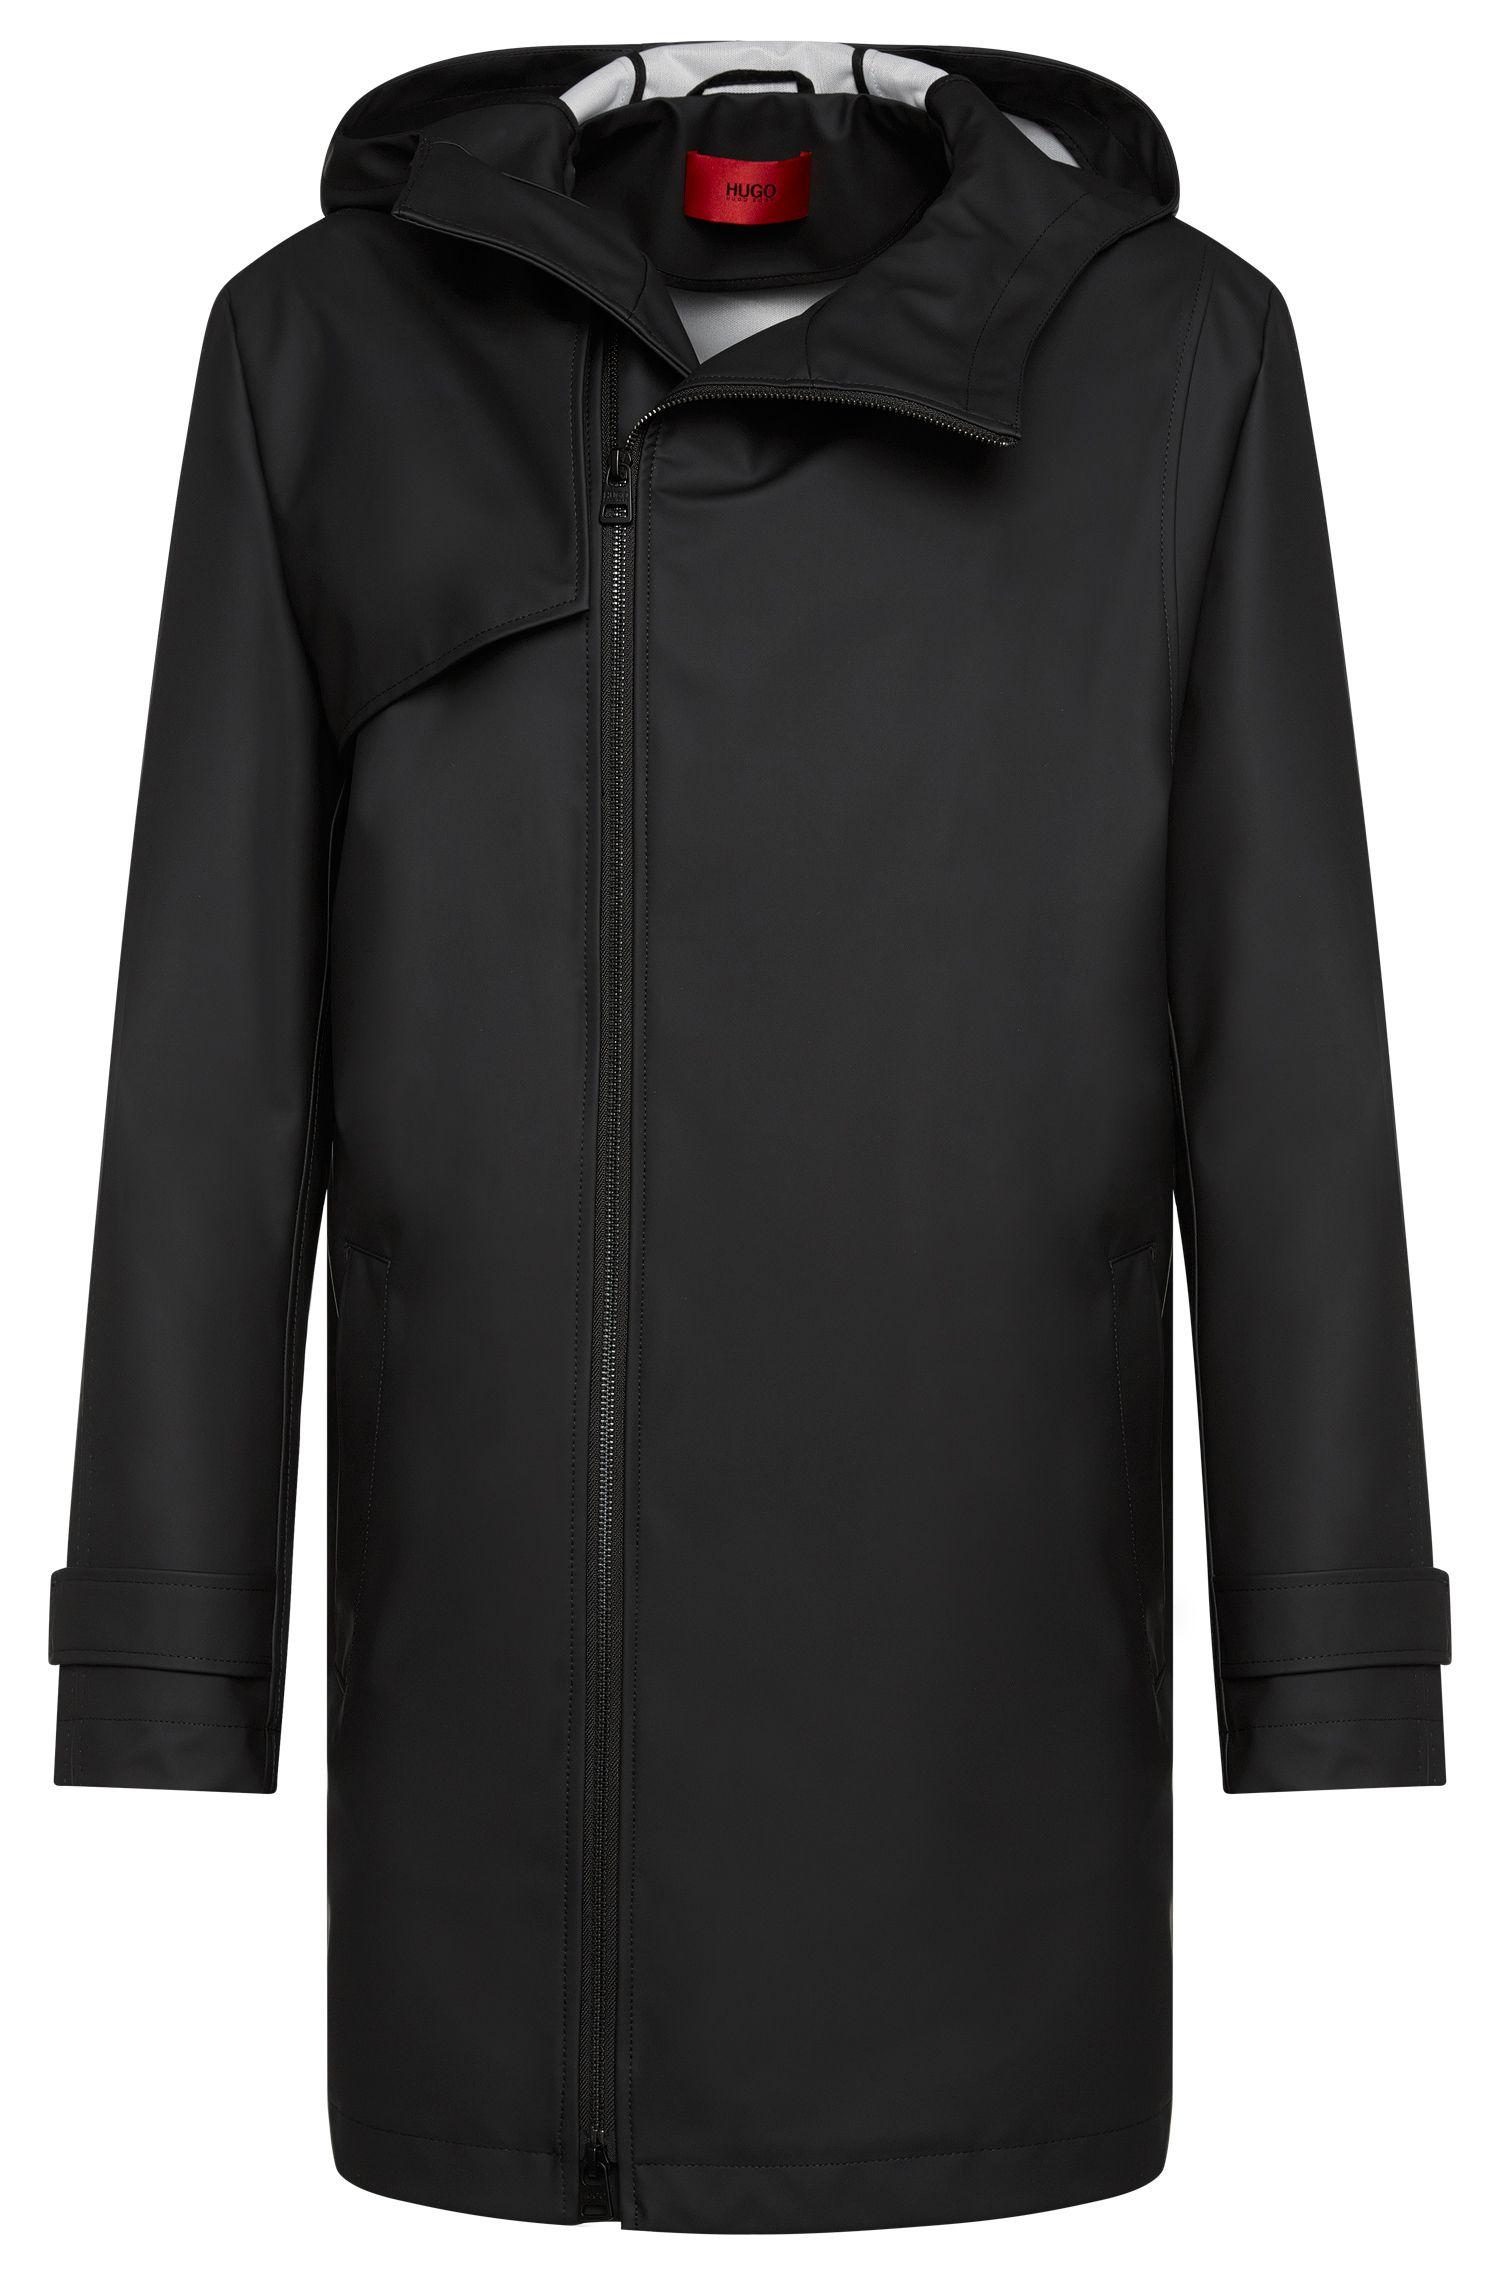 'Menoz' | Water Repellent Hooded Rain Coat